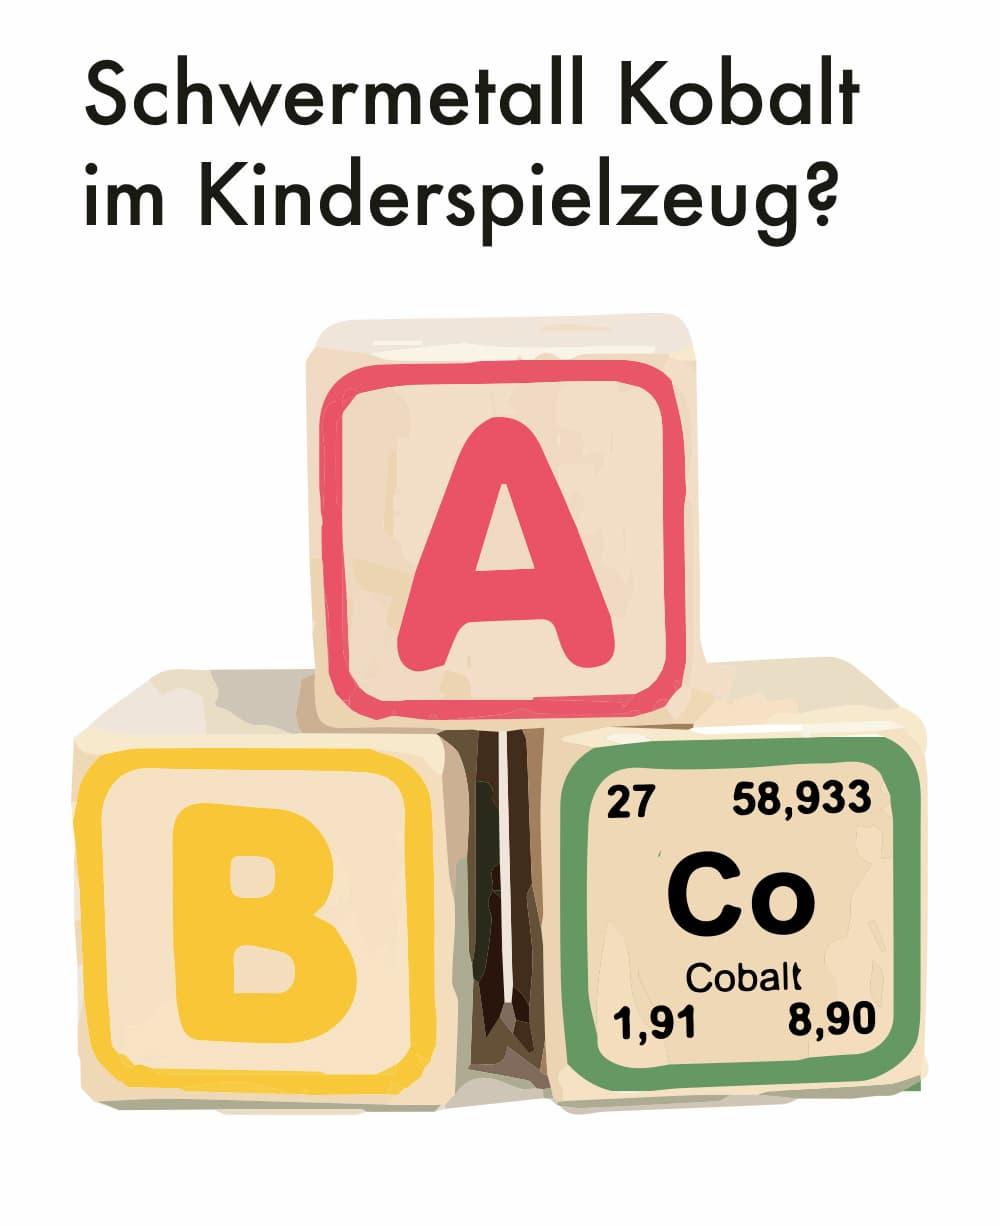 Schwermetall Kobalt im Kinderspielzeug?